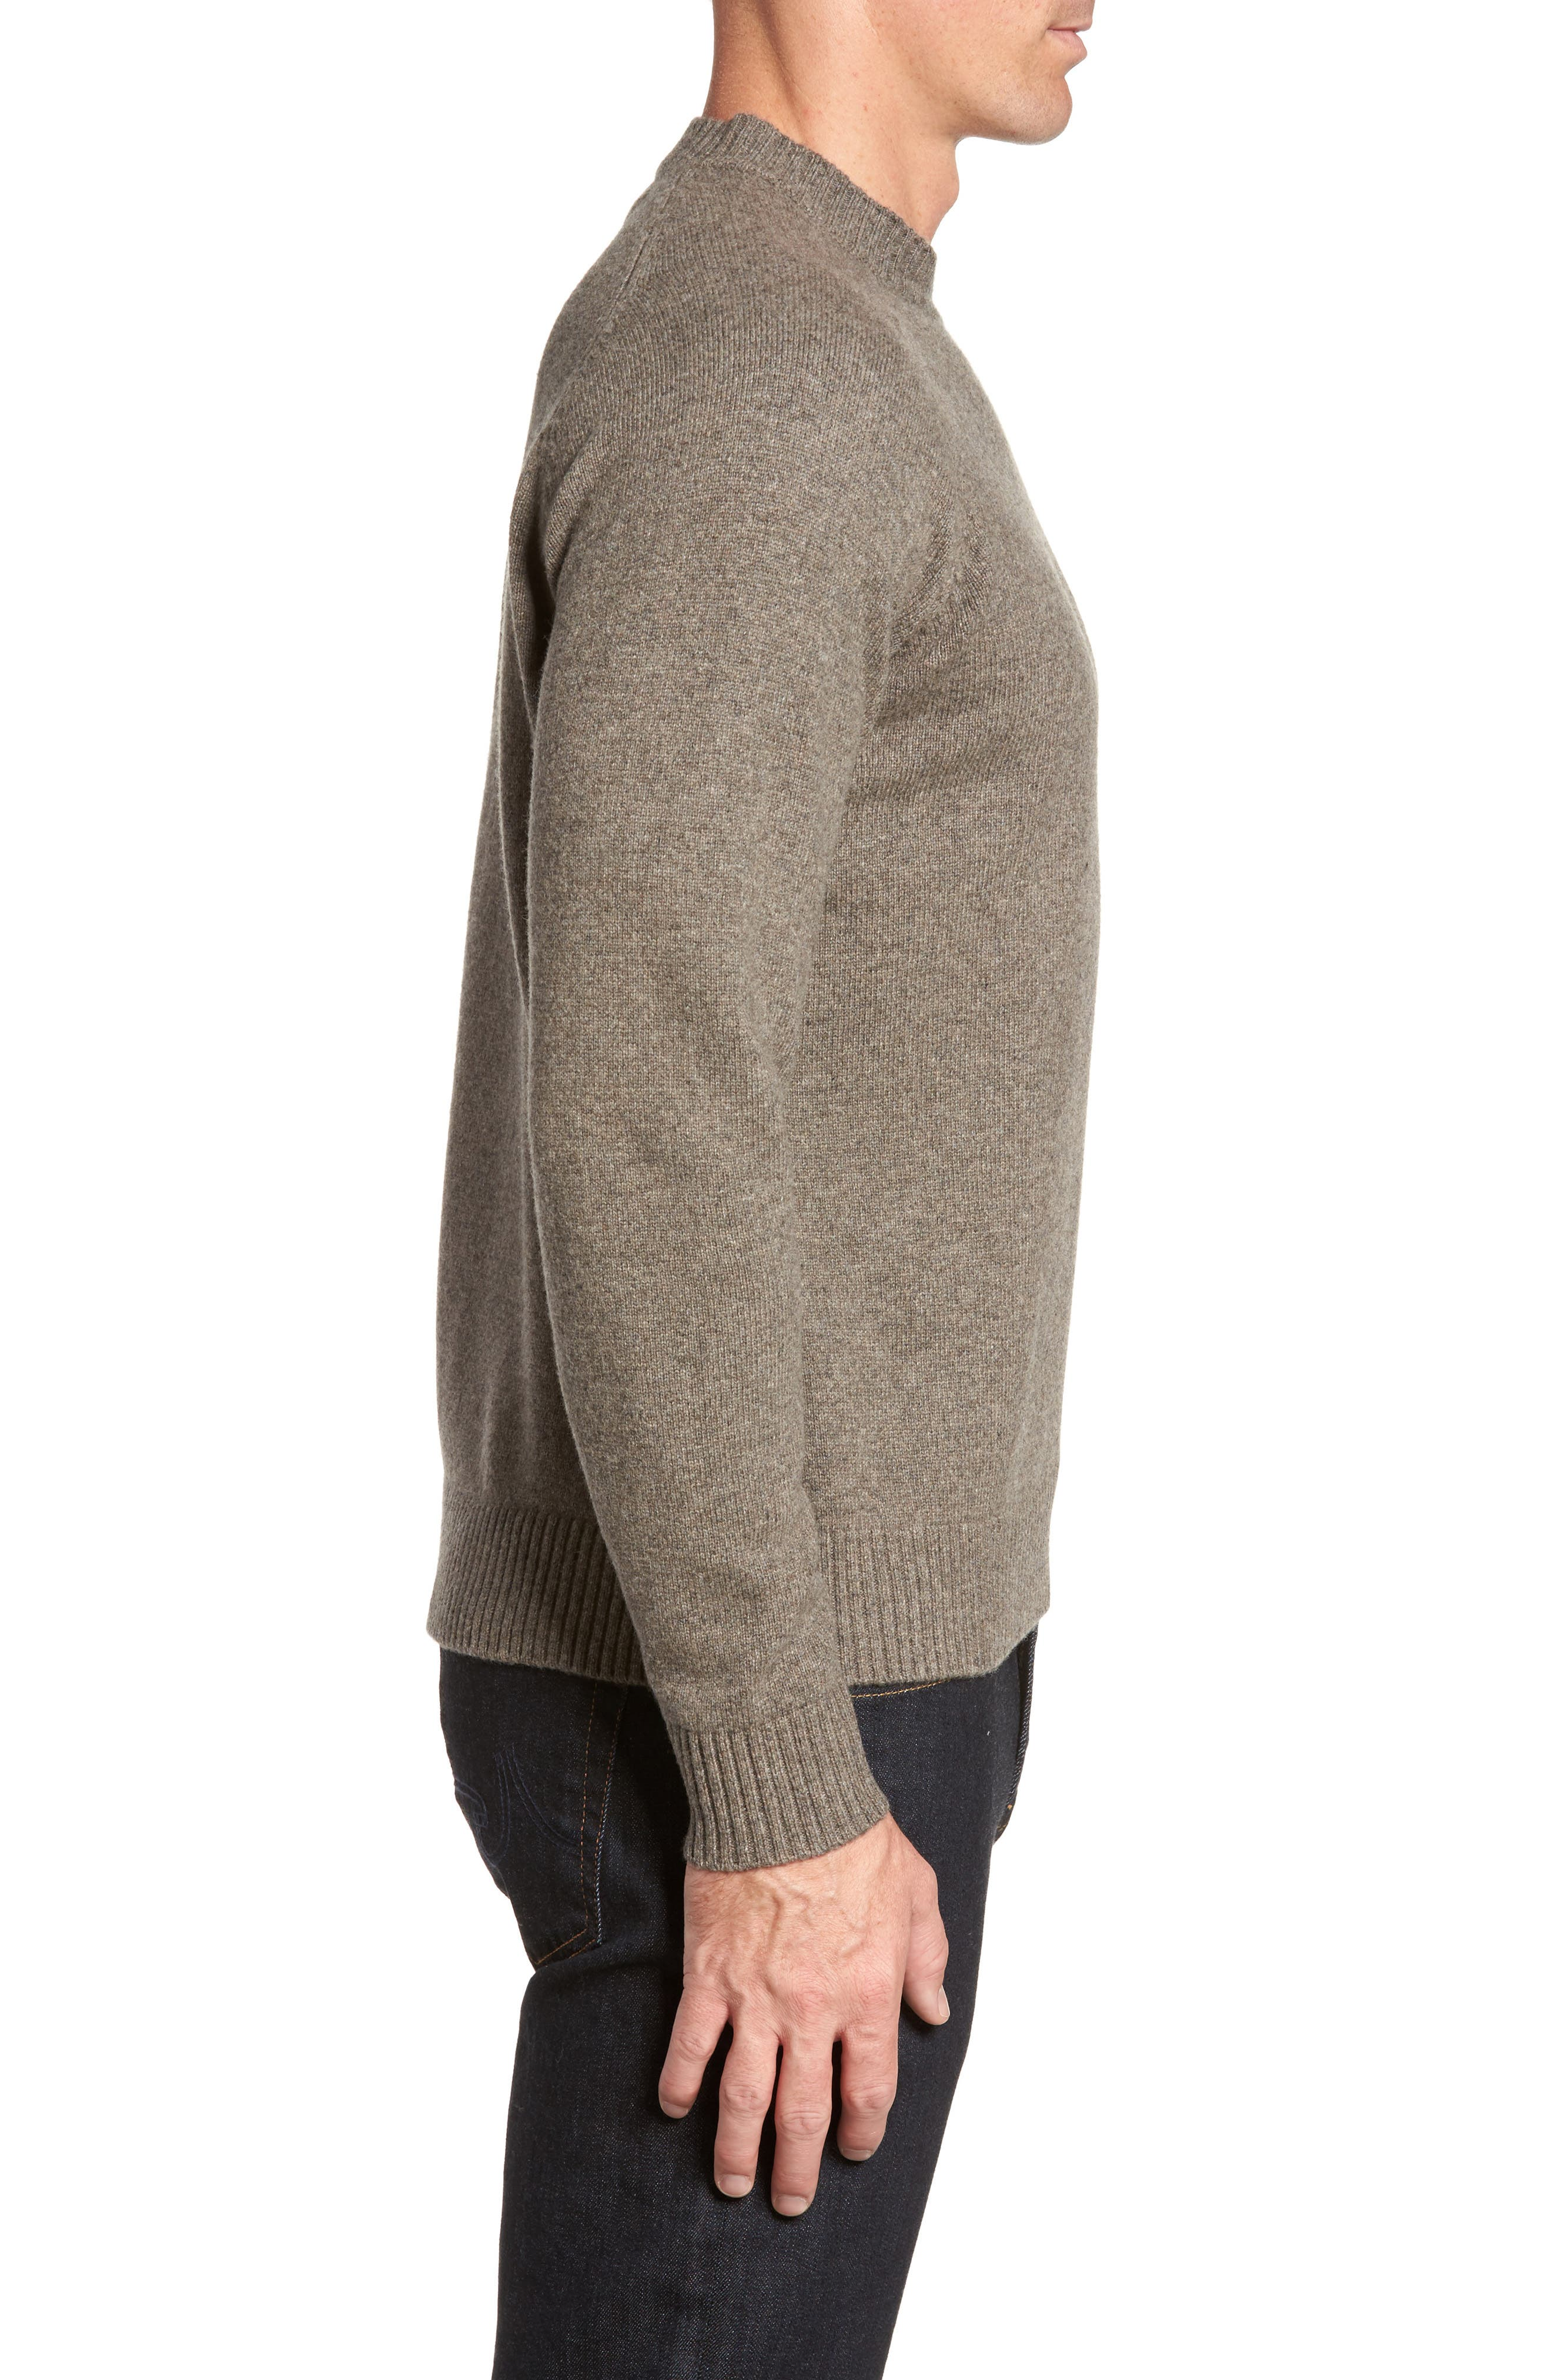 Crown Vintage Crewneck Sweatshirt,                             Alternate thumbnail 3, color,                             199